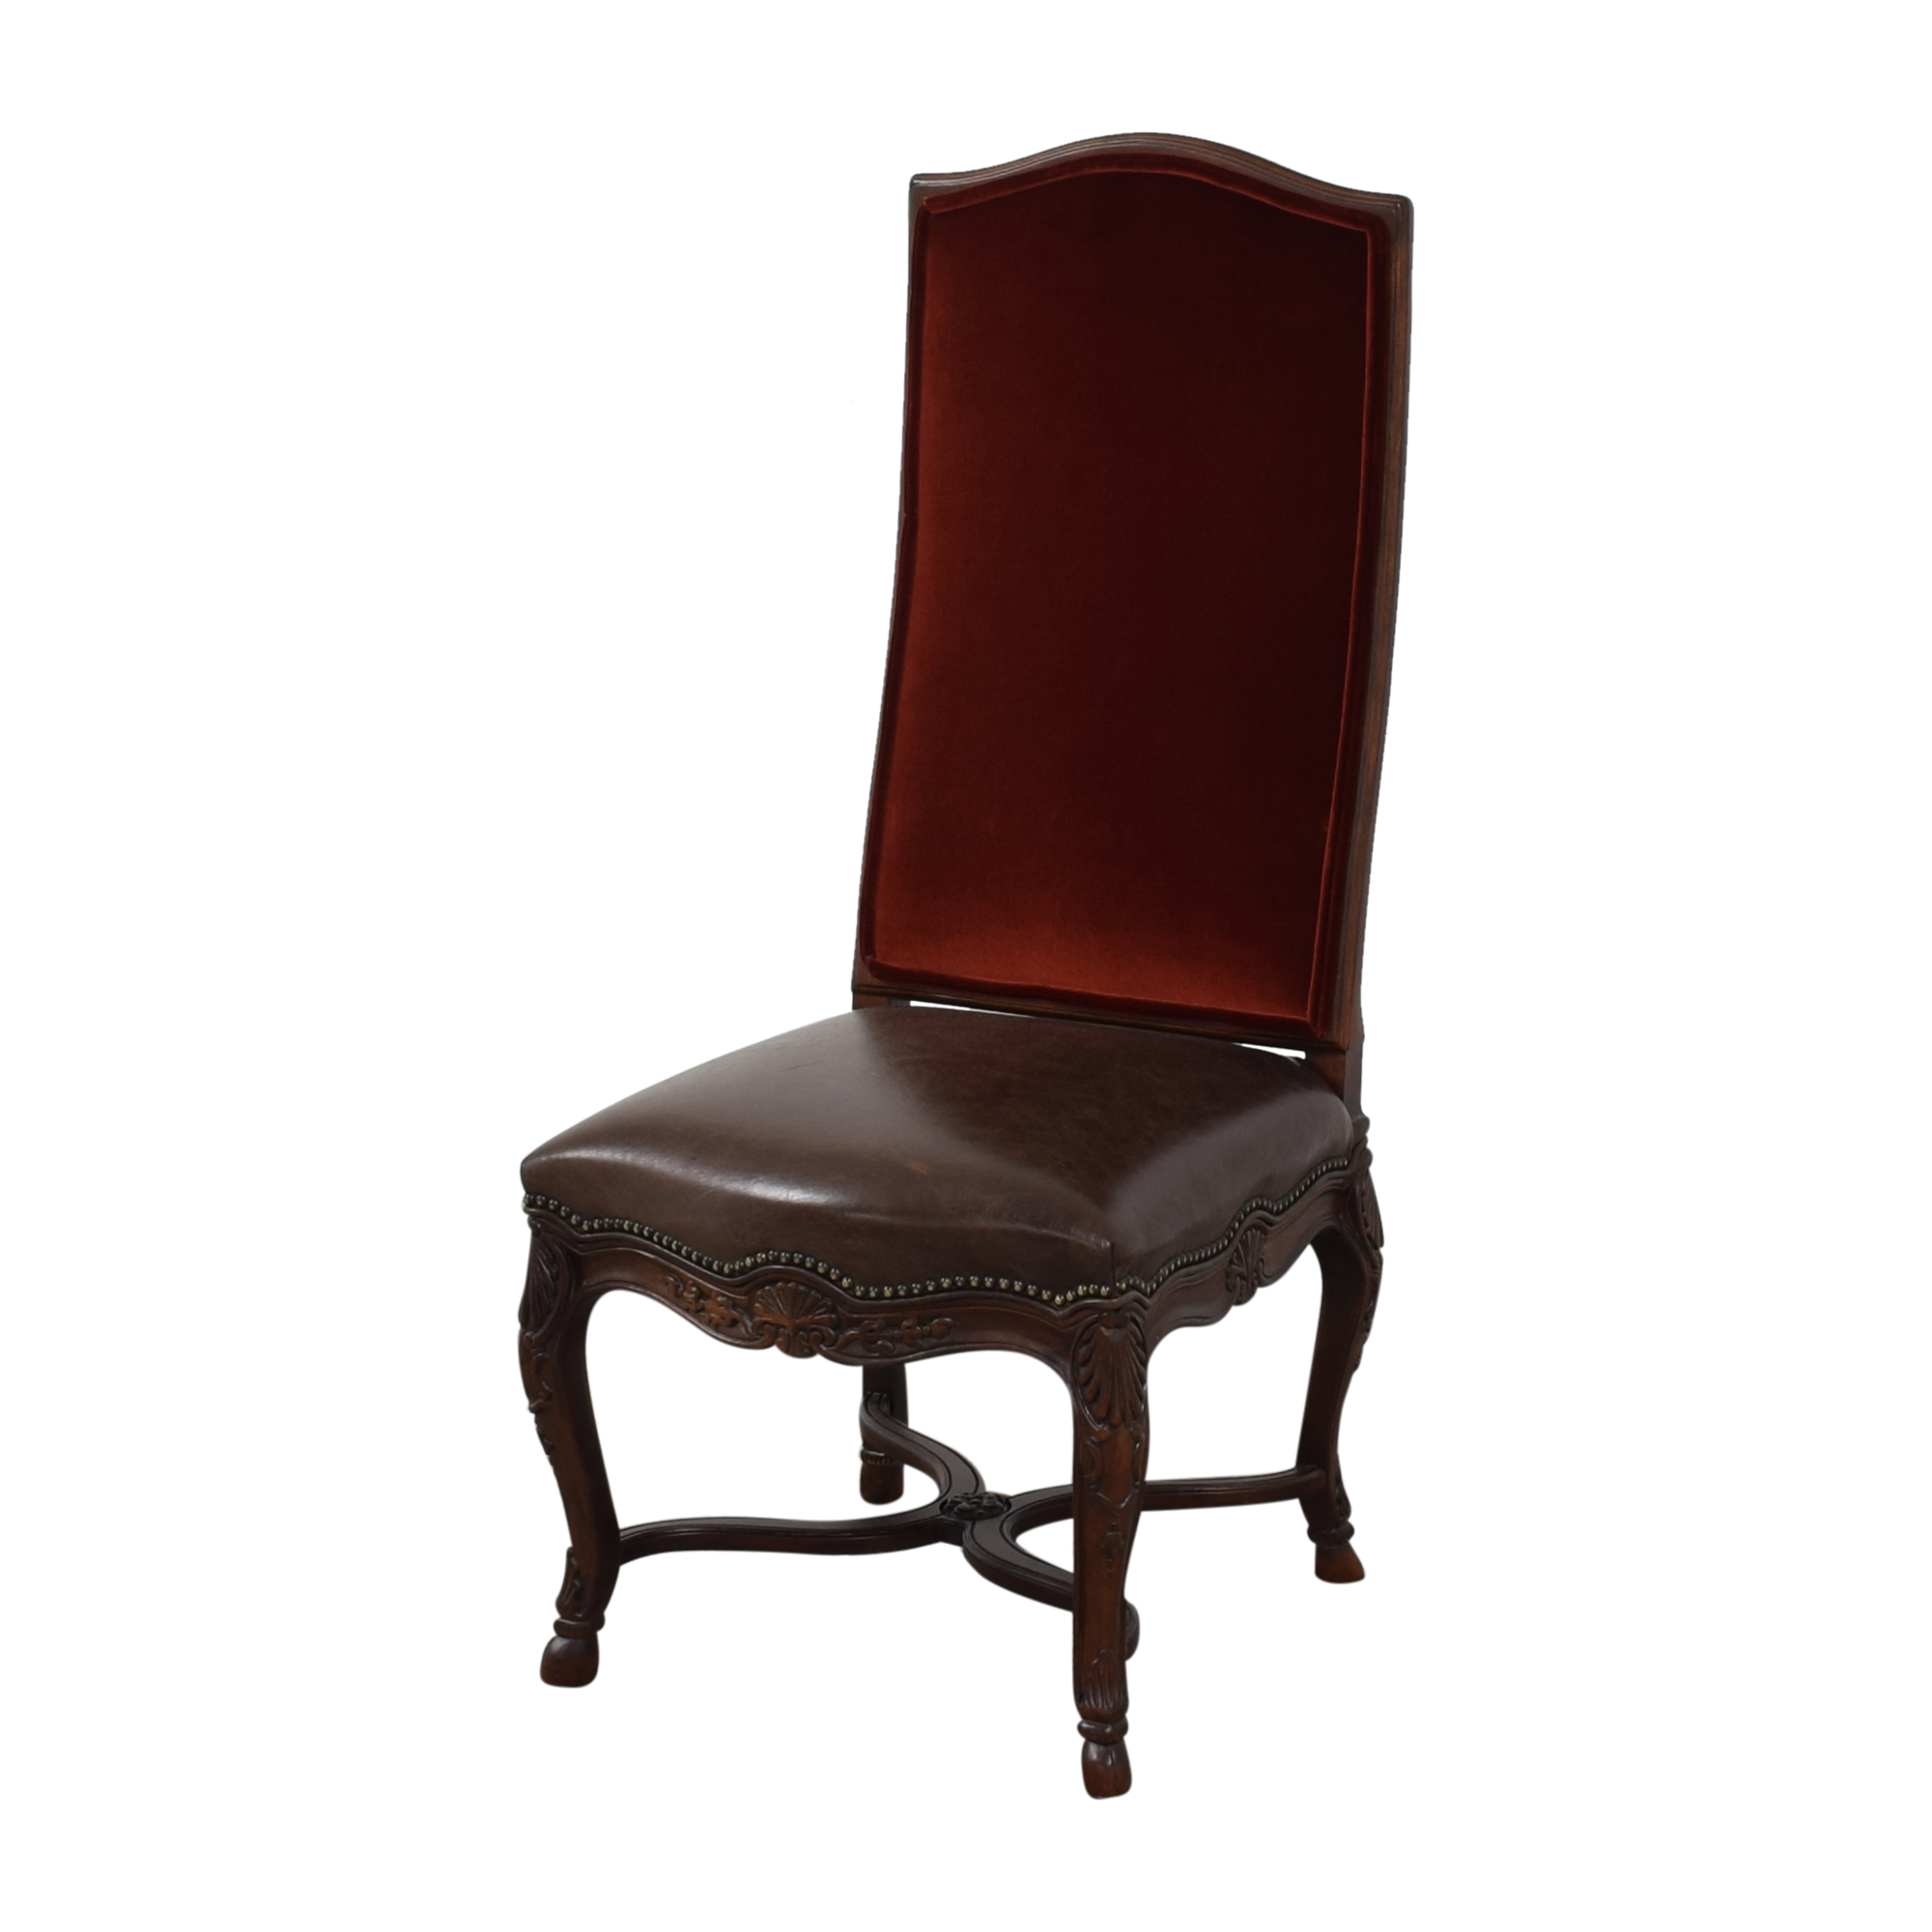 Safavieh Safavieh High Back Formal Dining Chairs nj